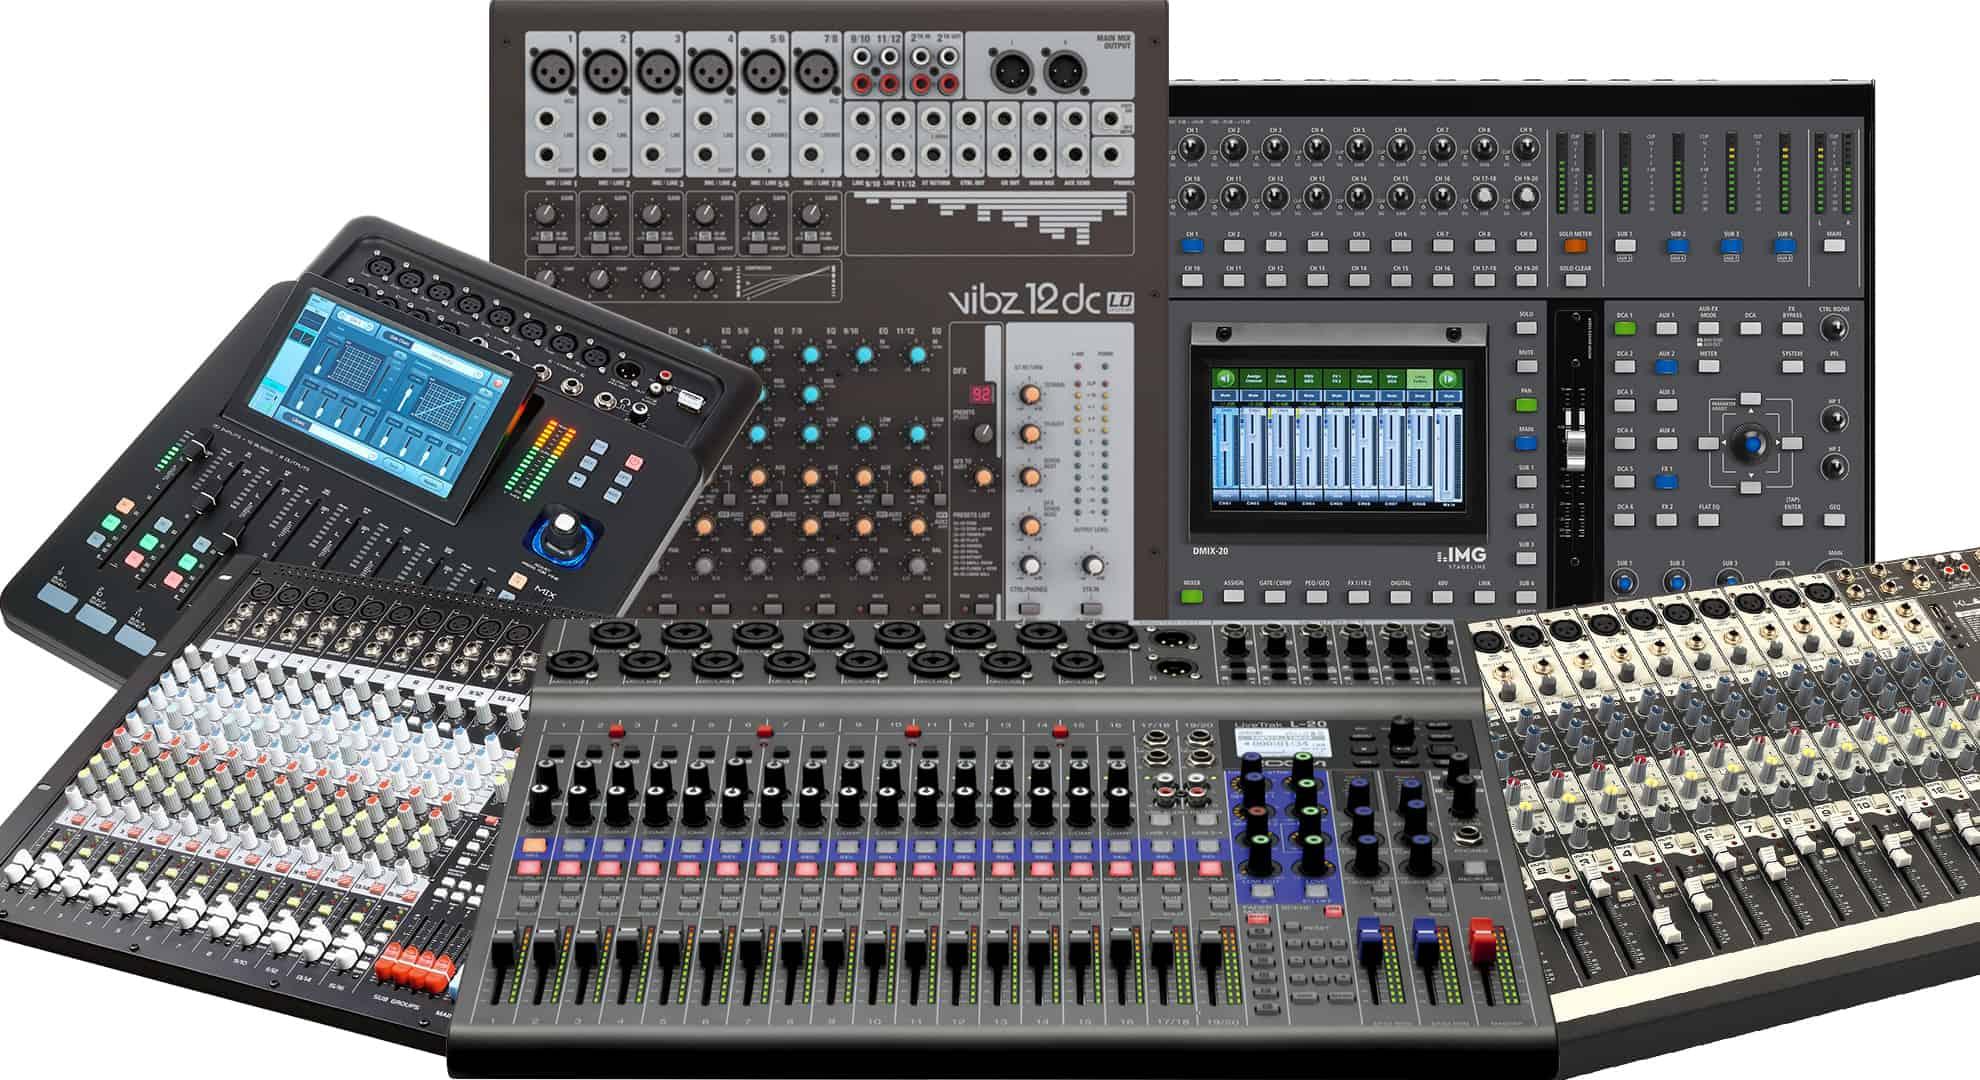 für Mischpulte /& PA-Endstufen Kleiner analoger Phono-Vorverstärker /& Entzerrer